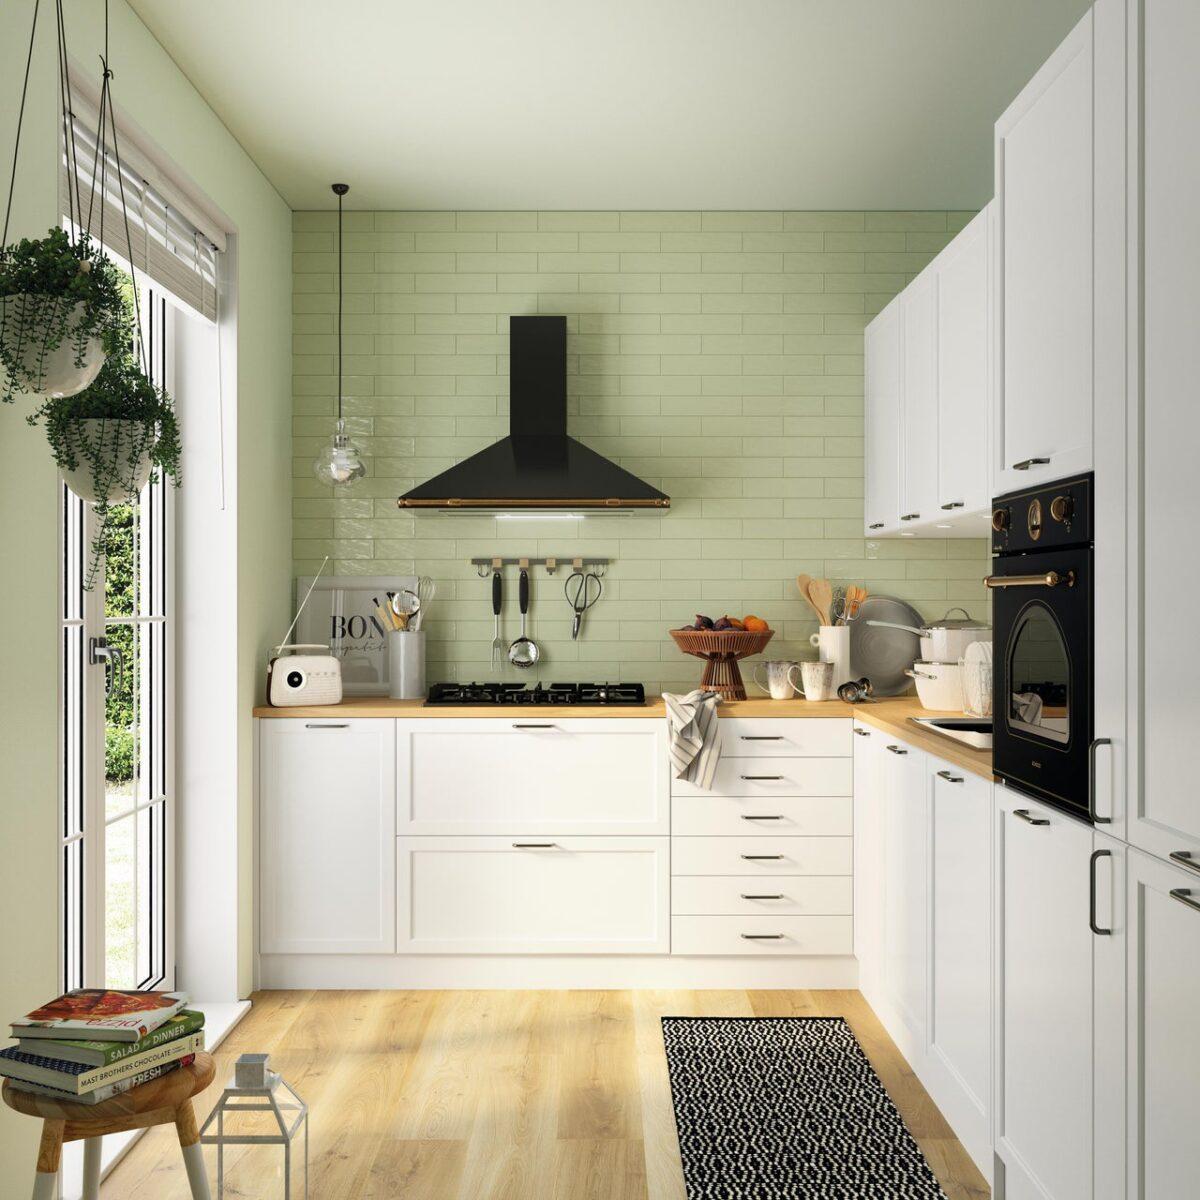 leroy-merlin-cucina-oxford